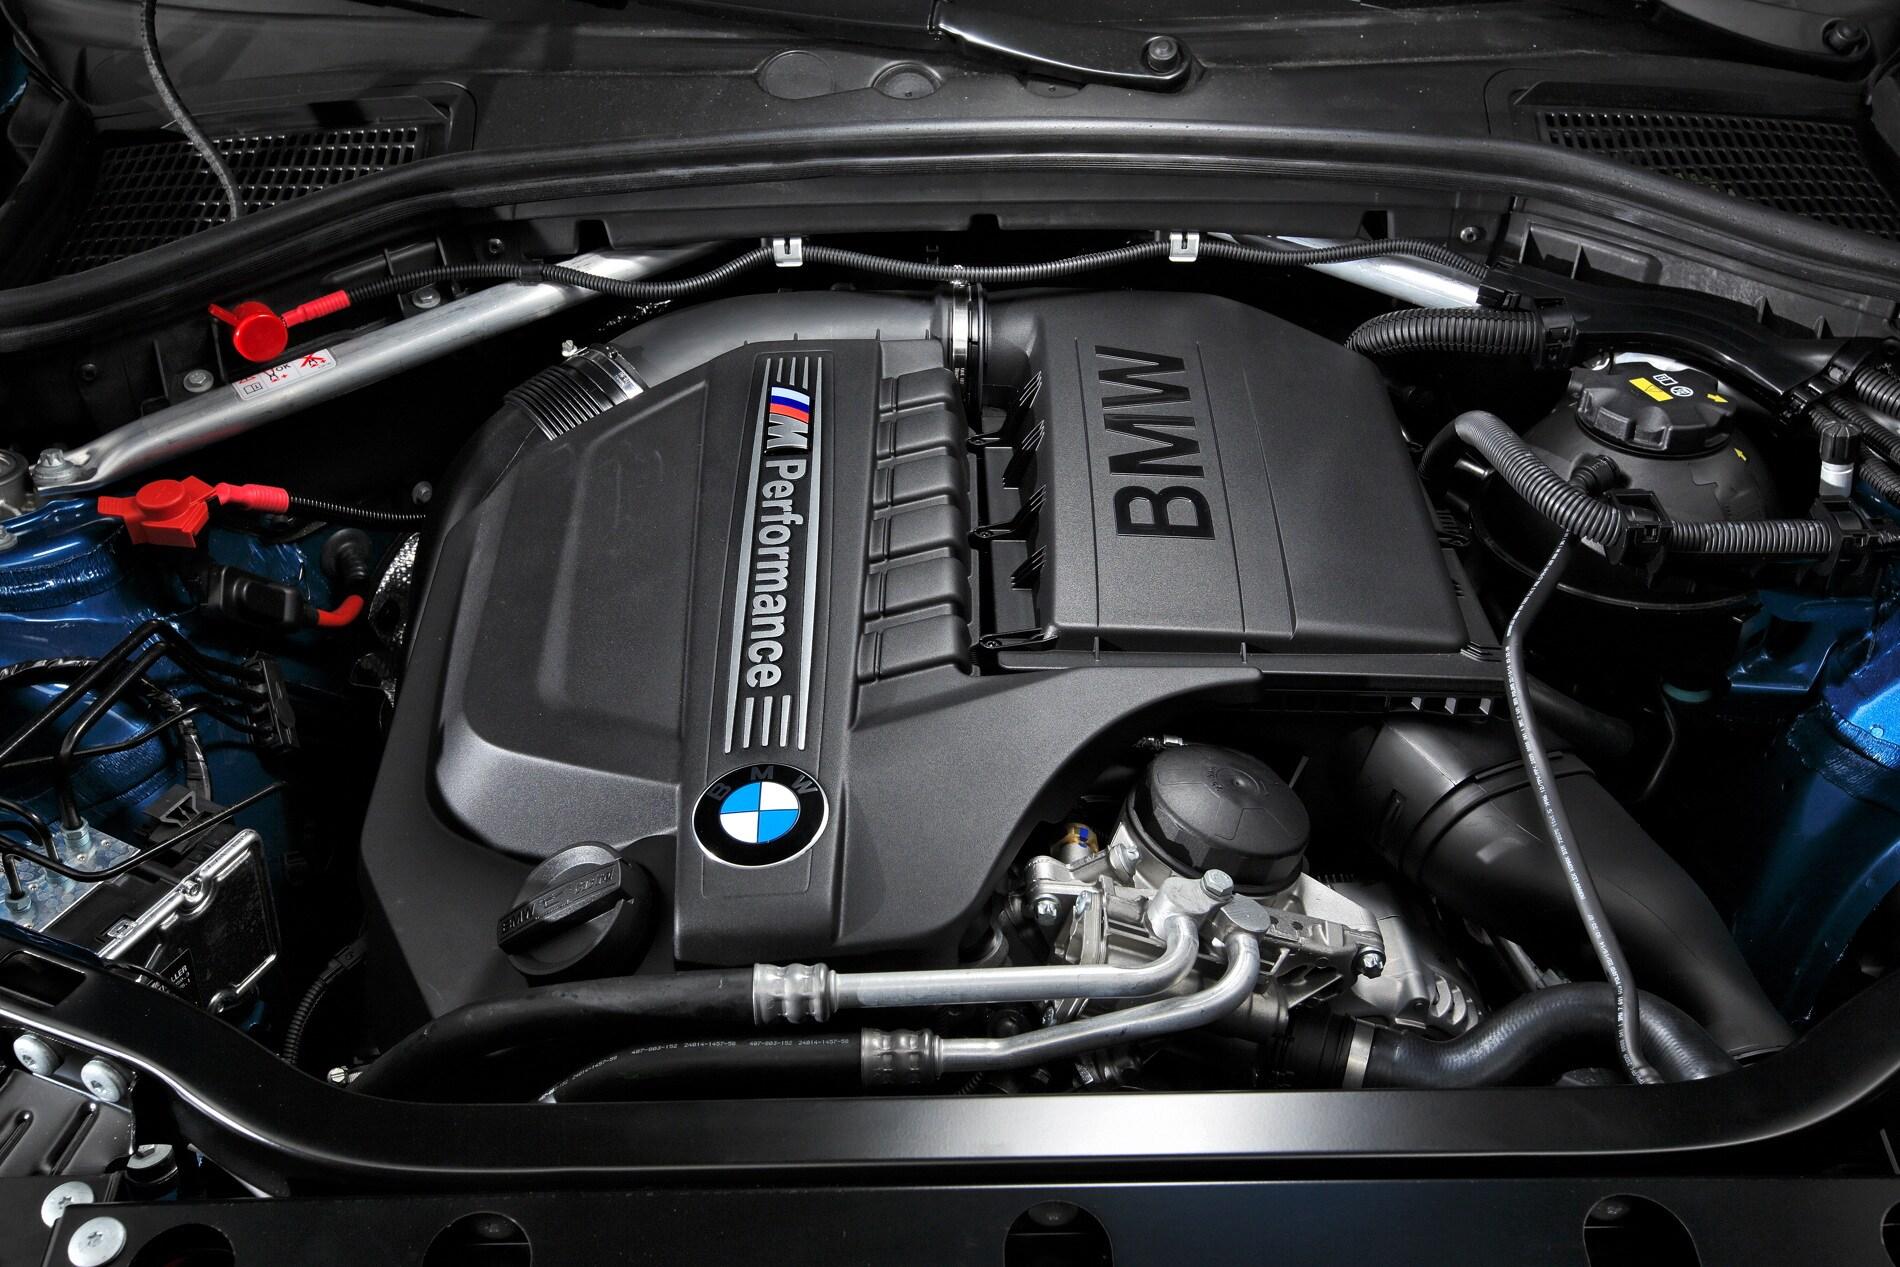 Bmw X Oil Capacitybmw E46 Change 325i 2001 2005 325xi Drain Plug Location M2 Sales Dealership Near Marlborough Ma